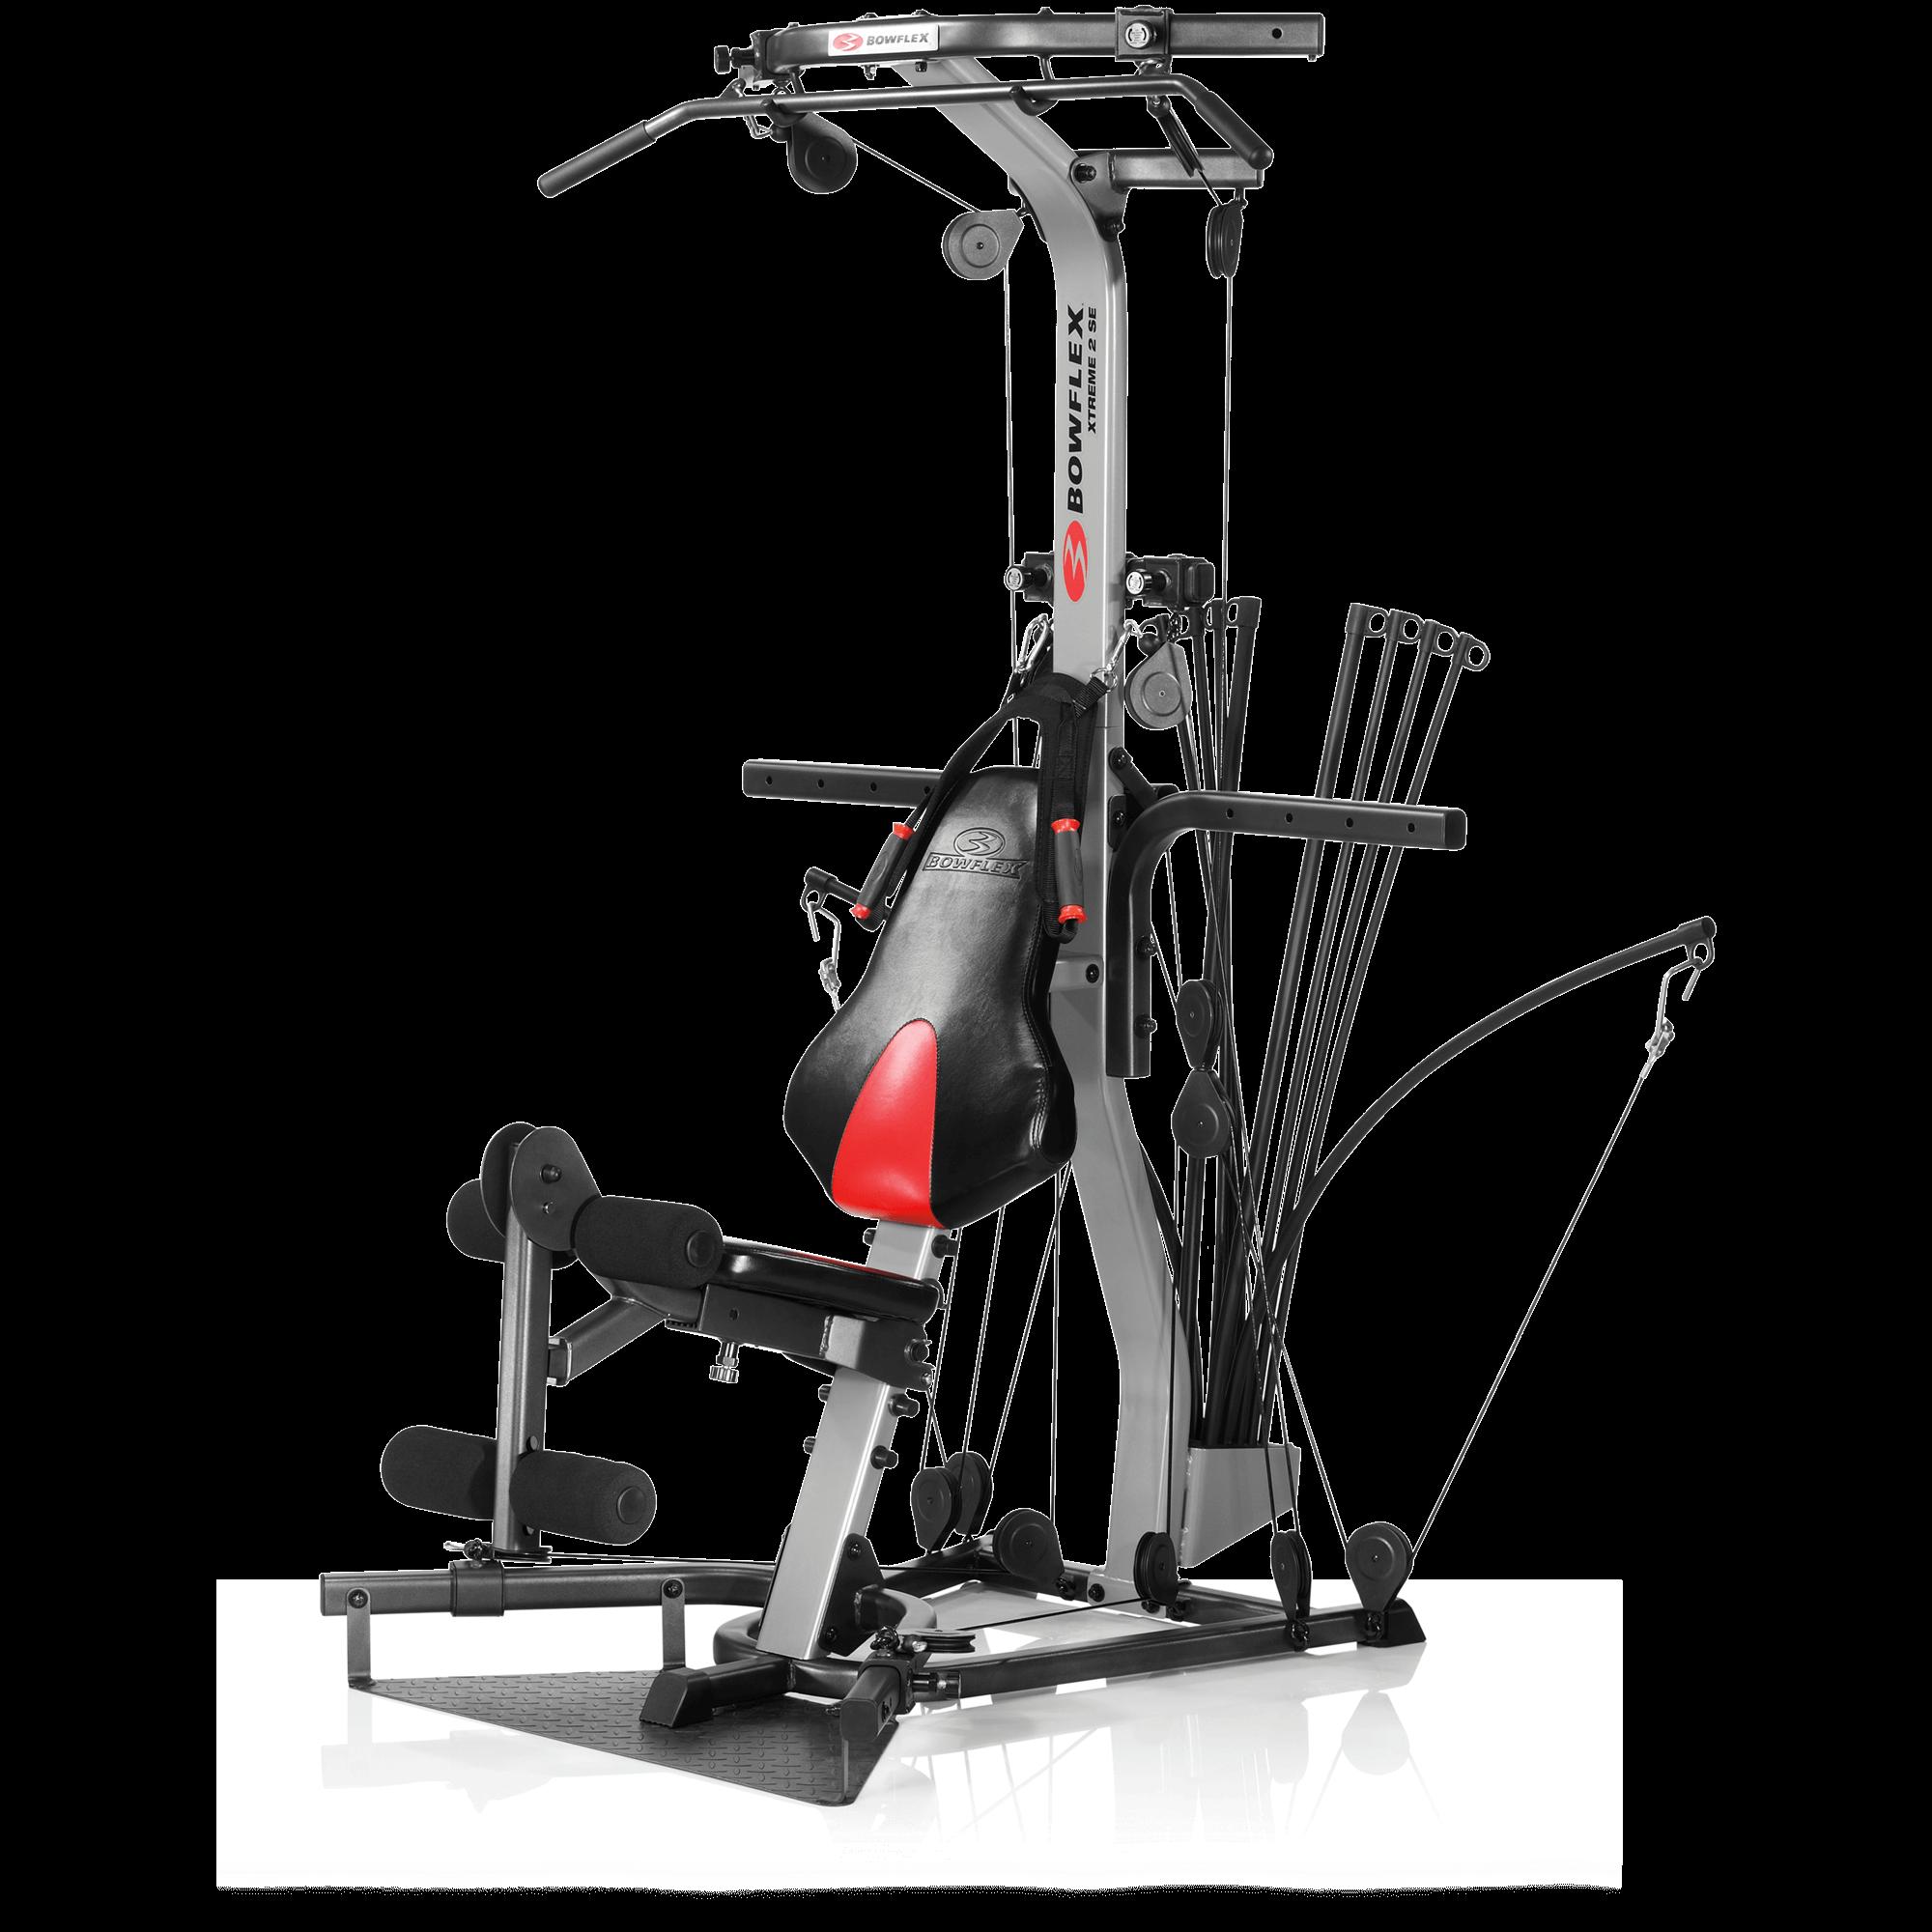 Bowflex Xtreme 2 SE Home Gym | Bowflex